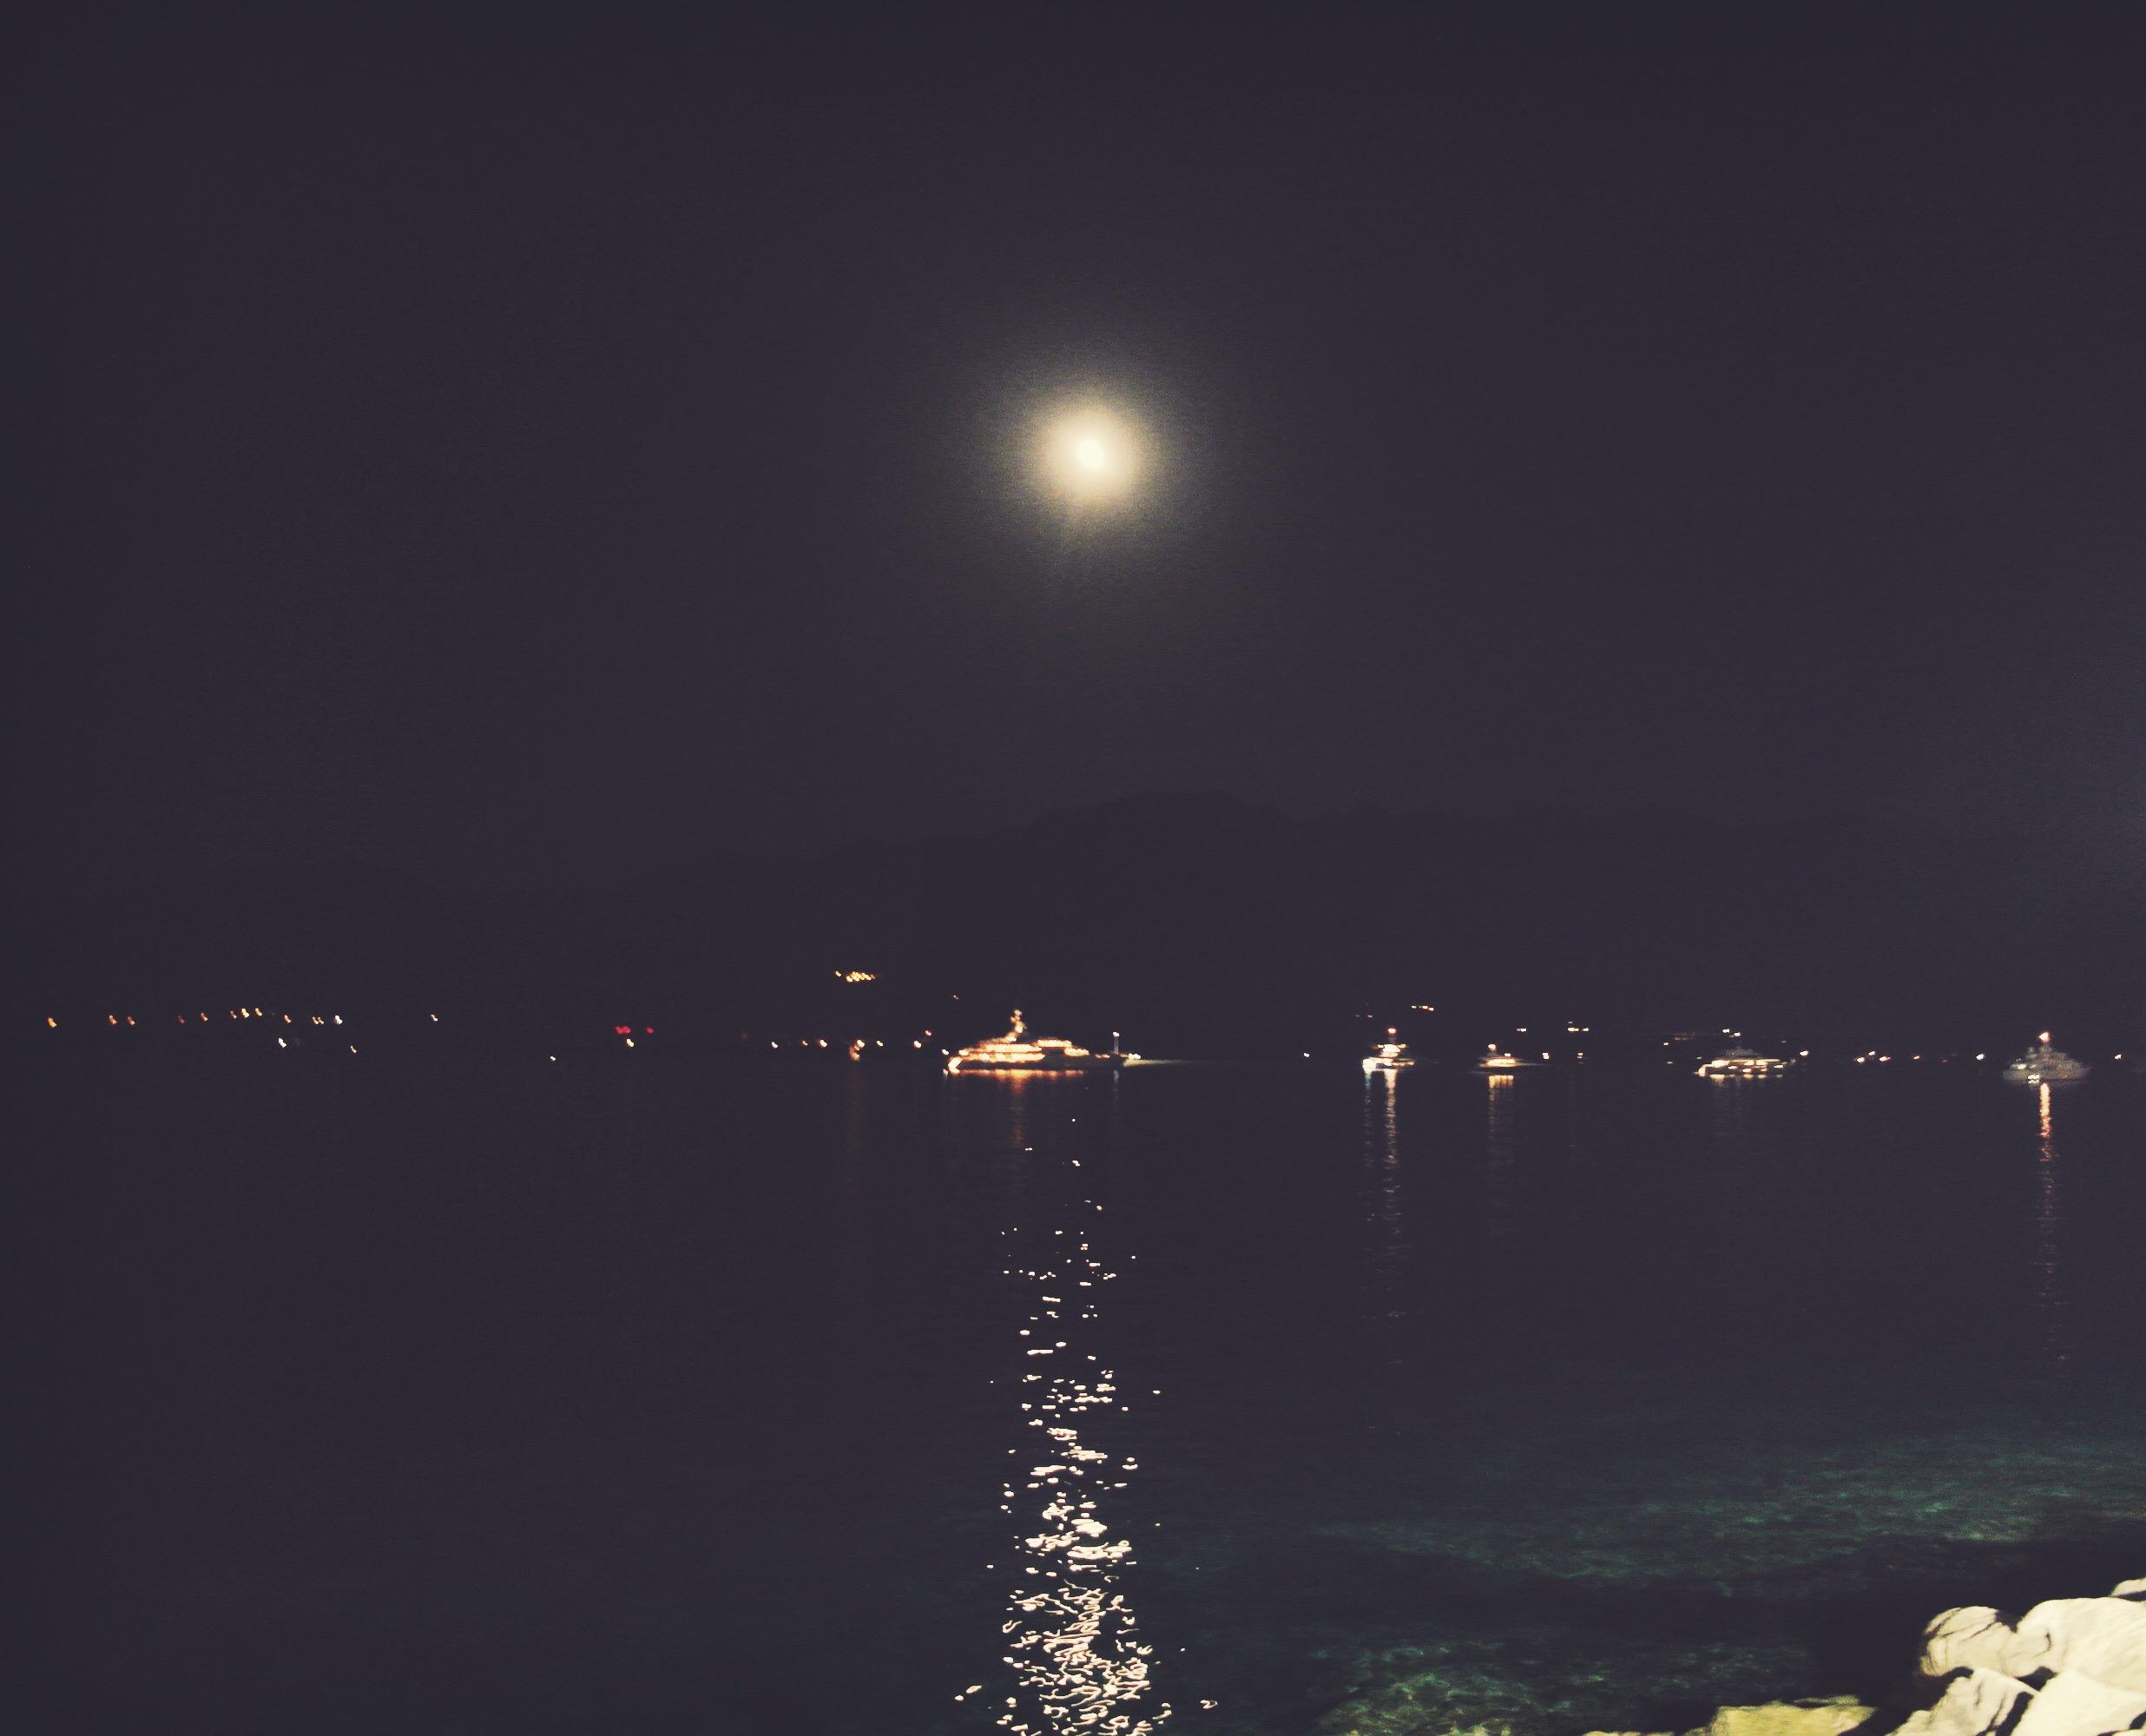 Calvi on the rocks 2015 - lune